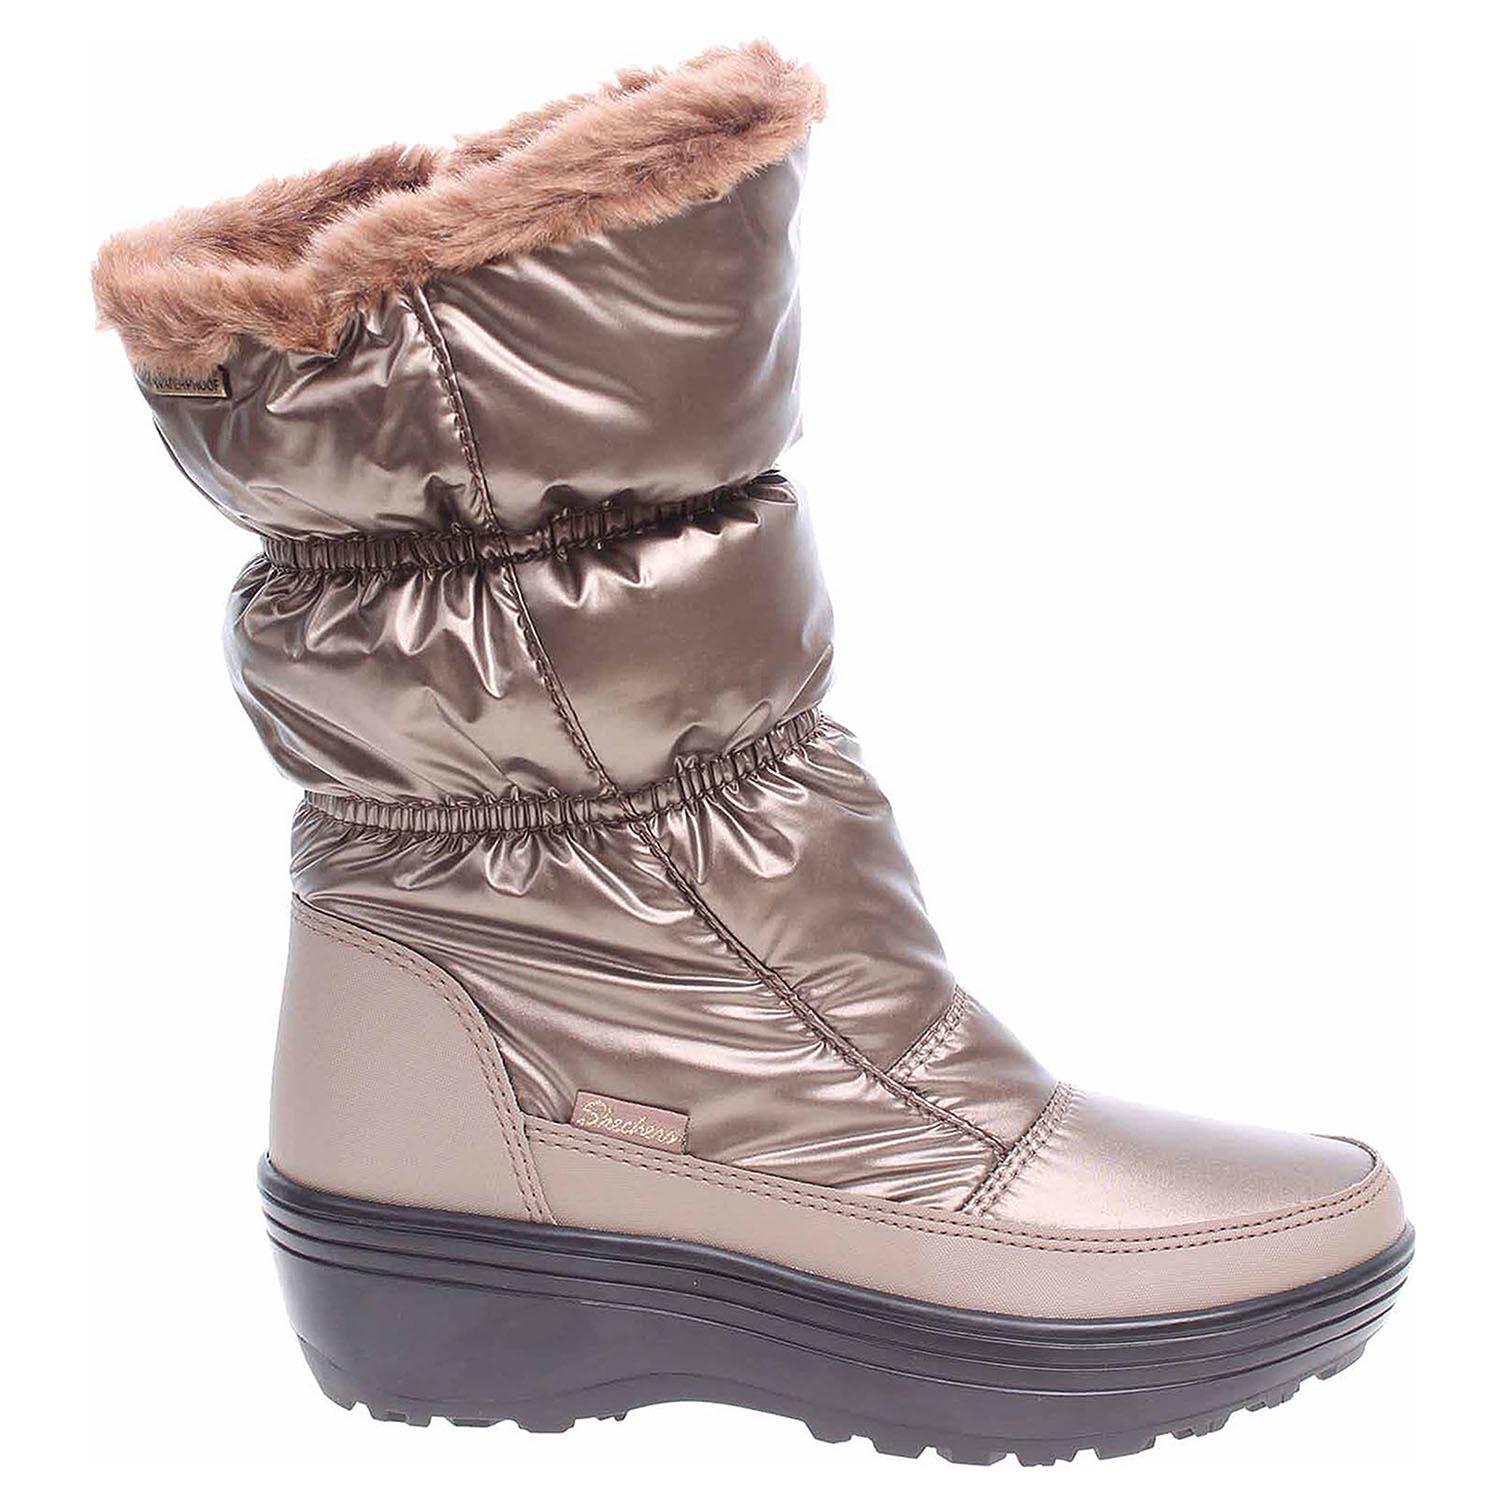 Skechers Alaska - Abyss bronze 49830 BRZ 40